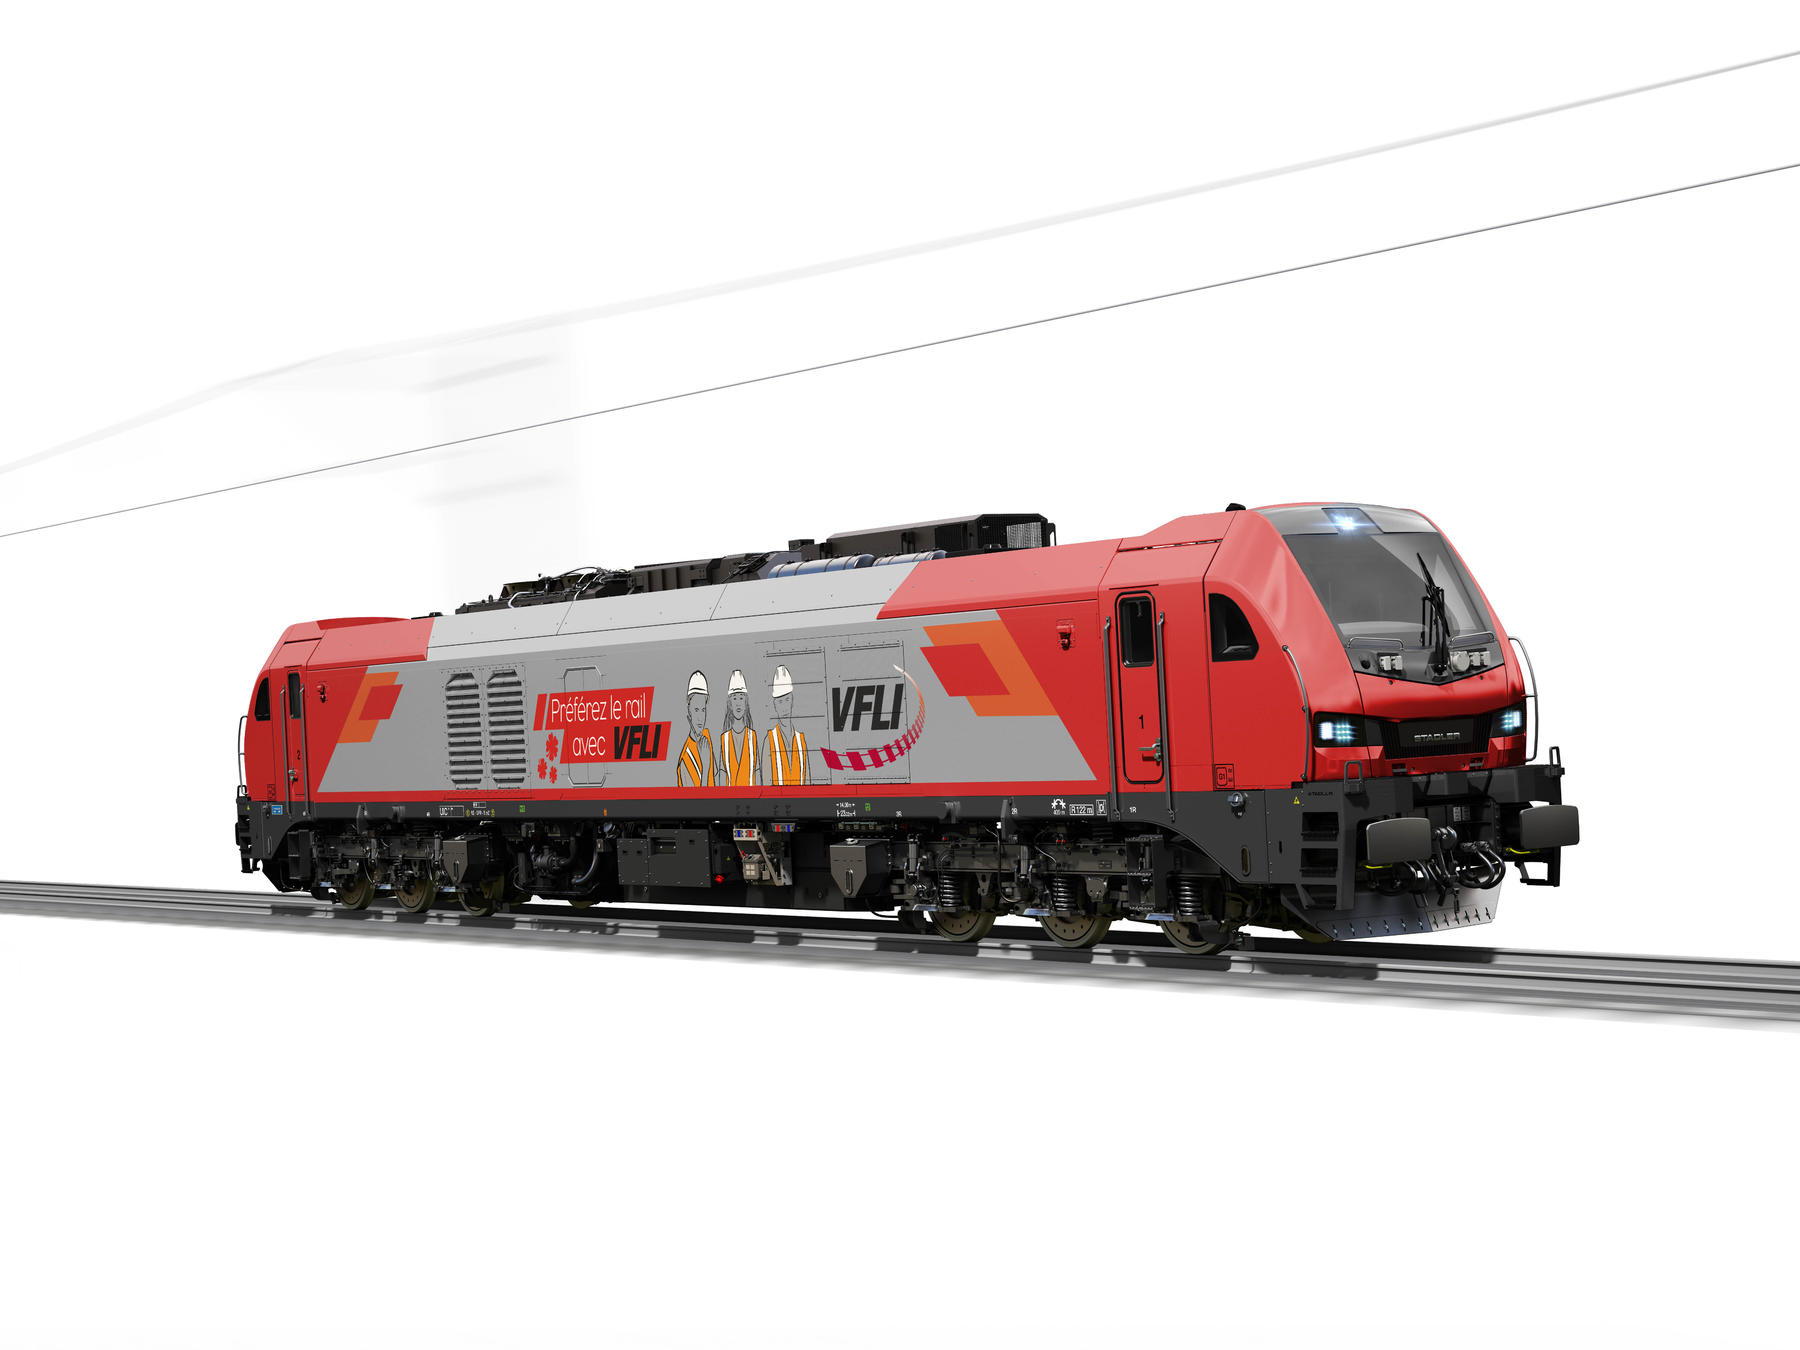 Stadler EURO 4001 six-axle locomotive for VFLI